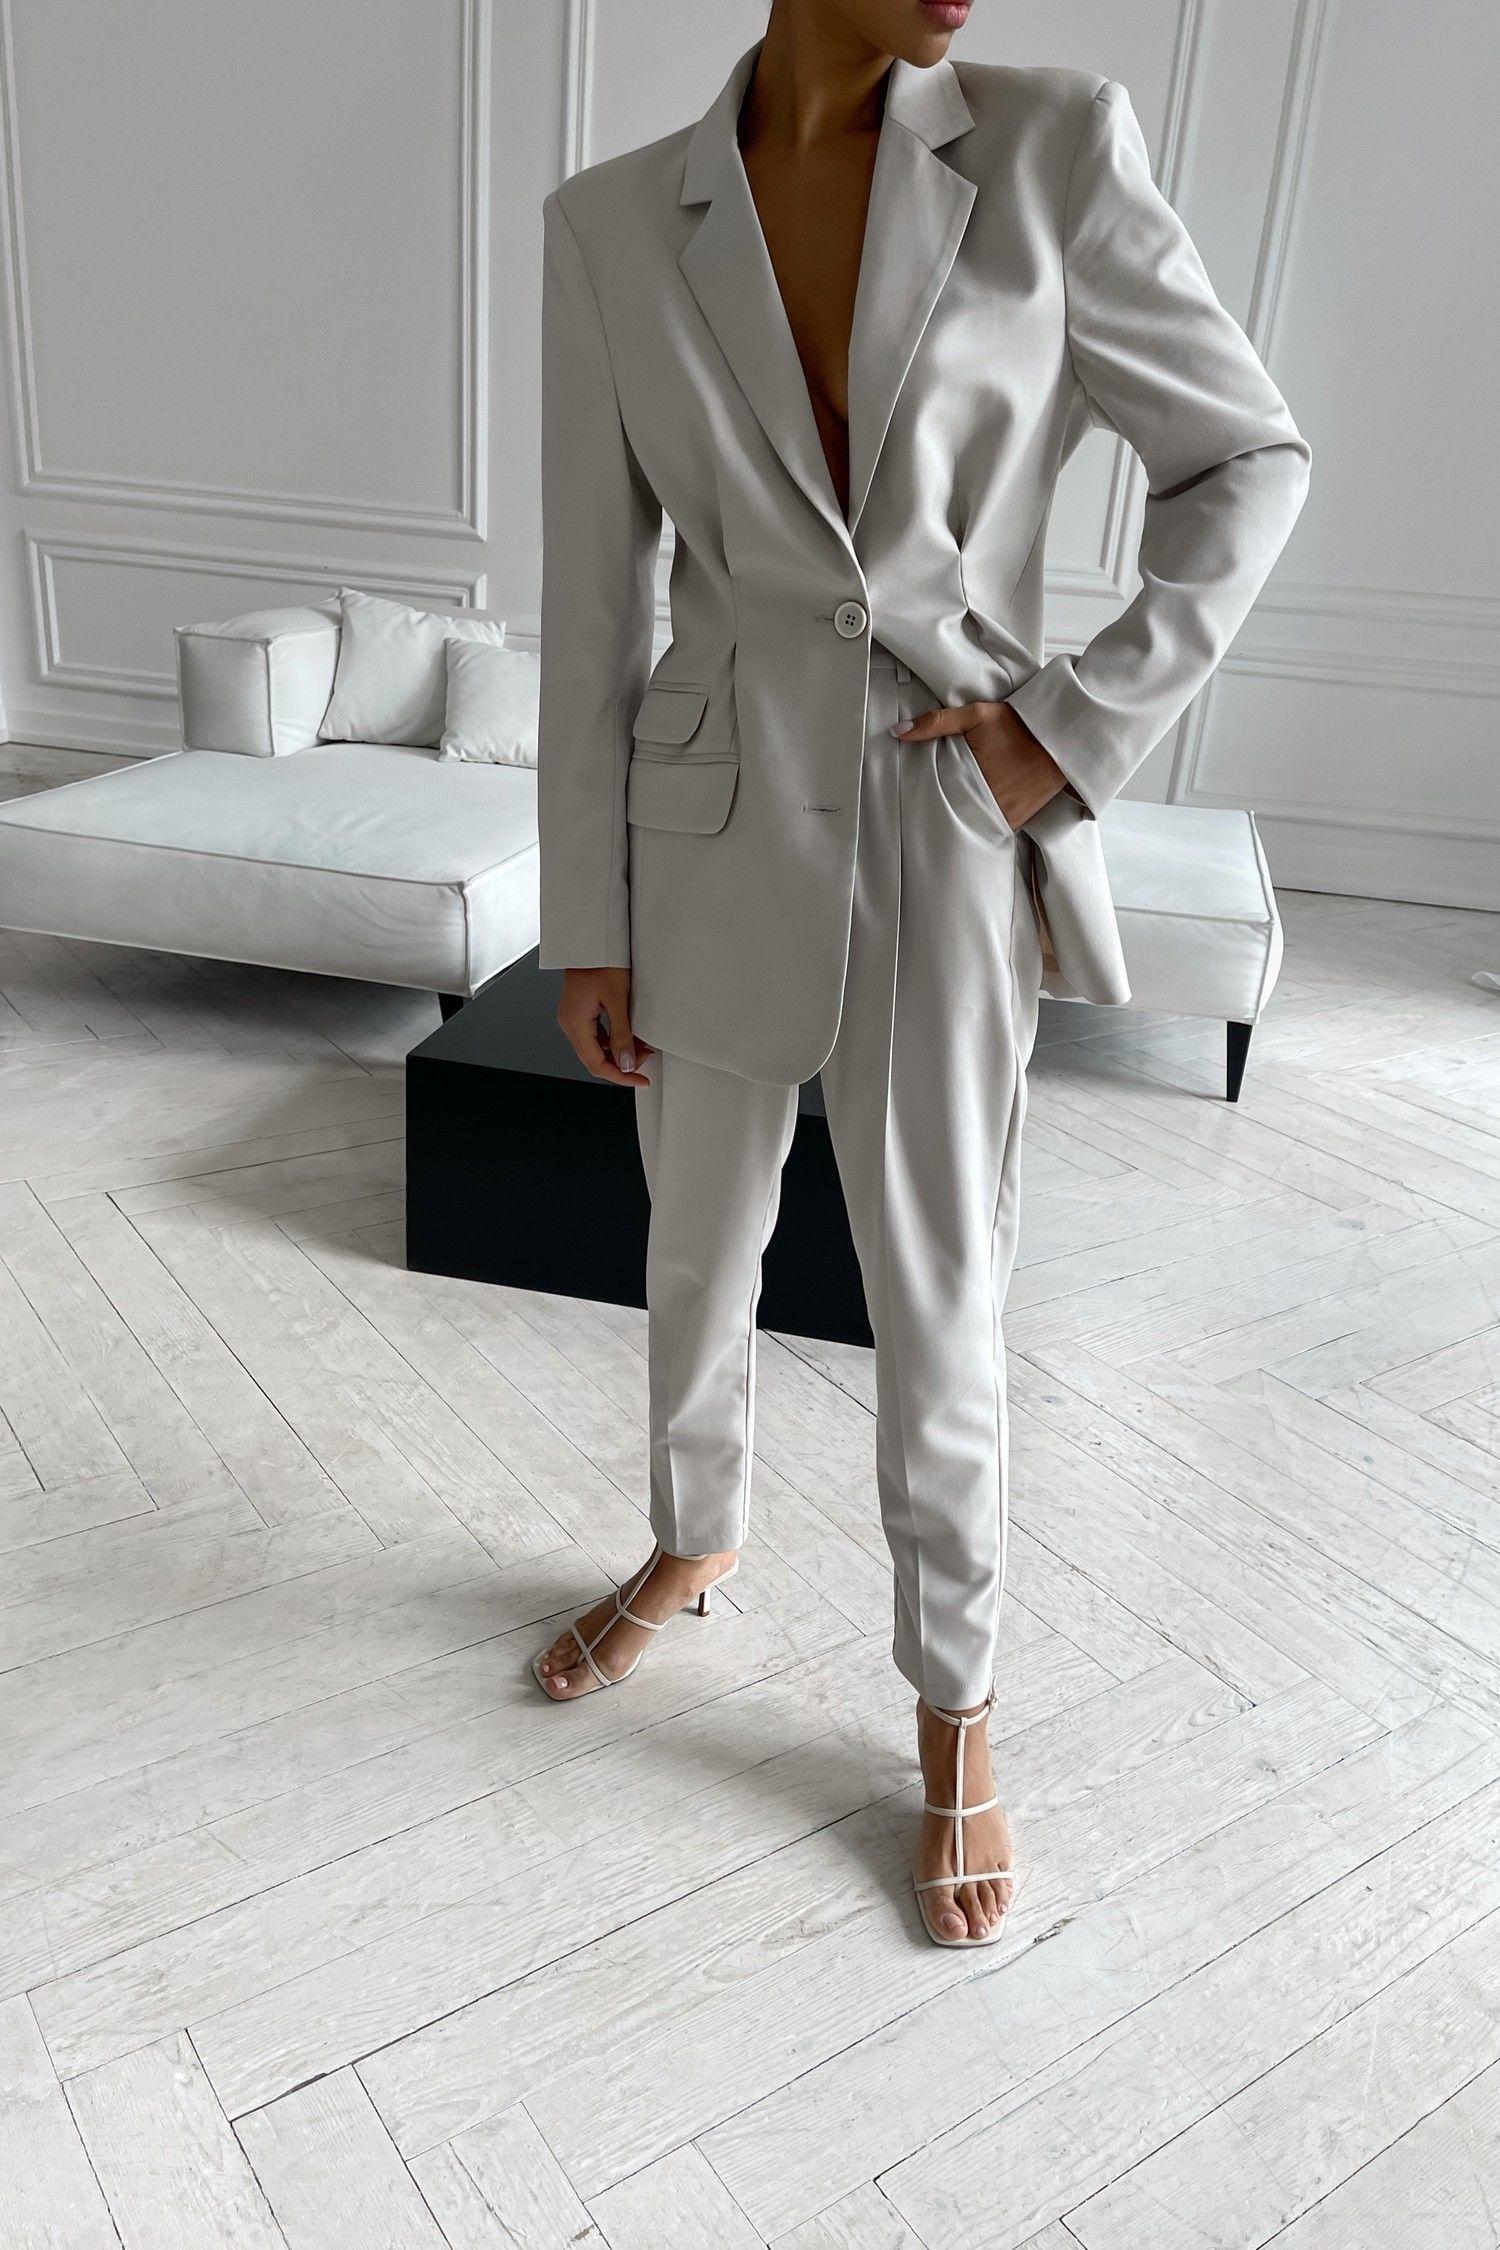 Брючный костюм светло-серый - THE LACE